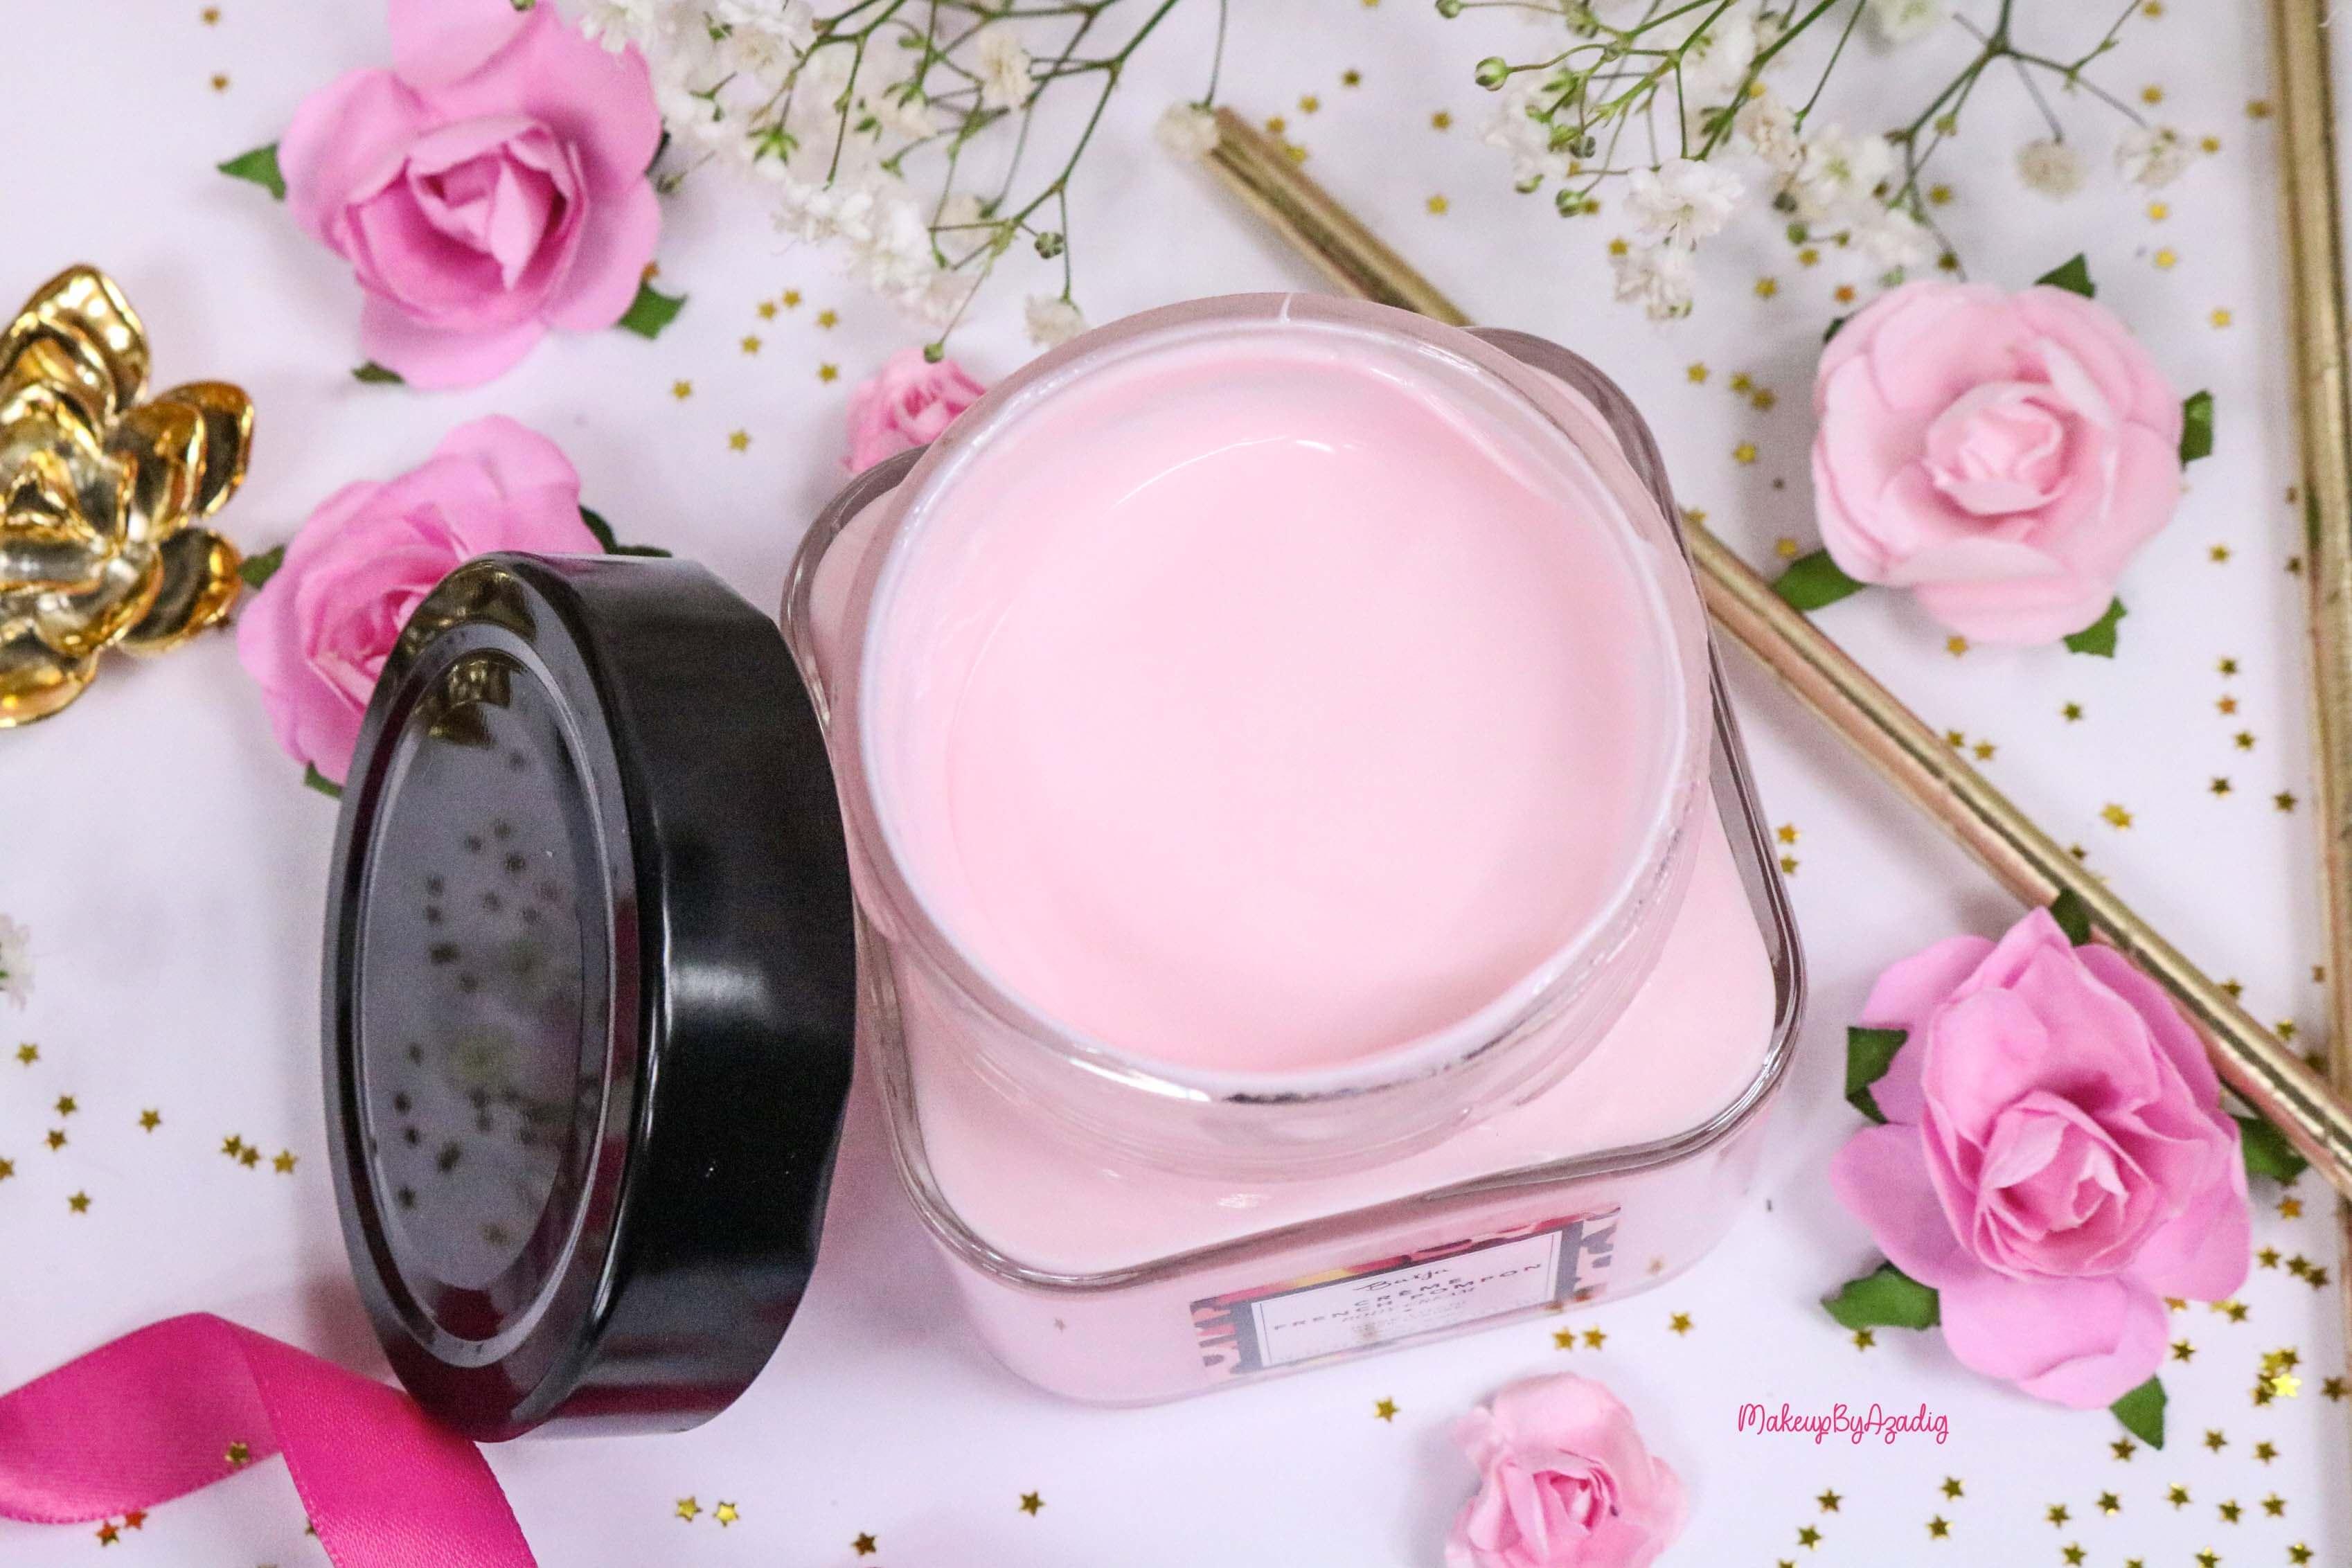 revue-creme-corps-hydratant-french-pompon-baija-rose-litchi-sephora-avis-prix-madeinfrance-makeupbyazadig-grasse